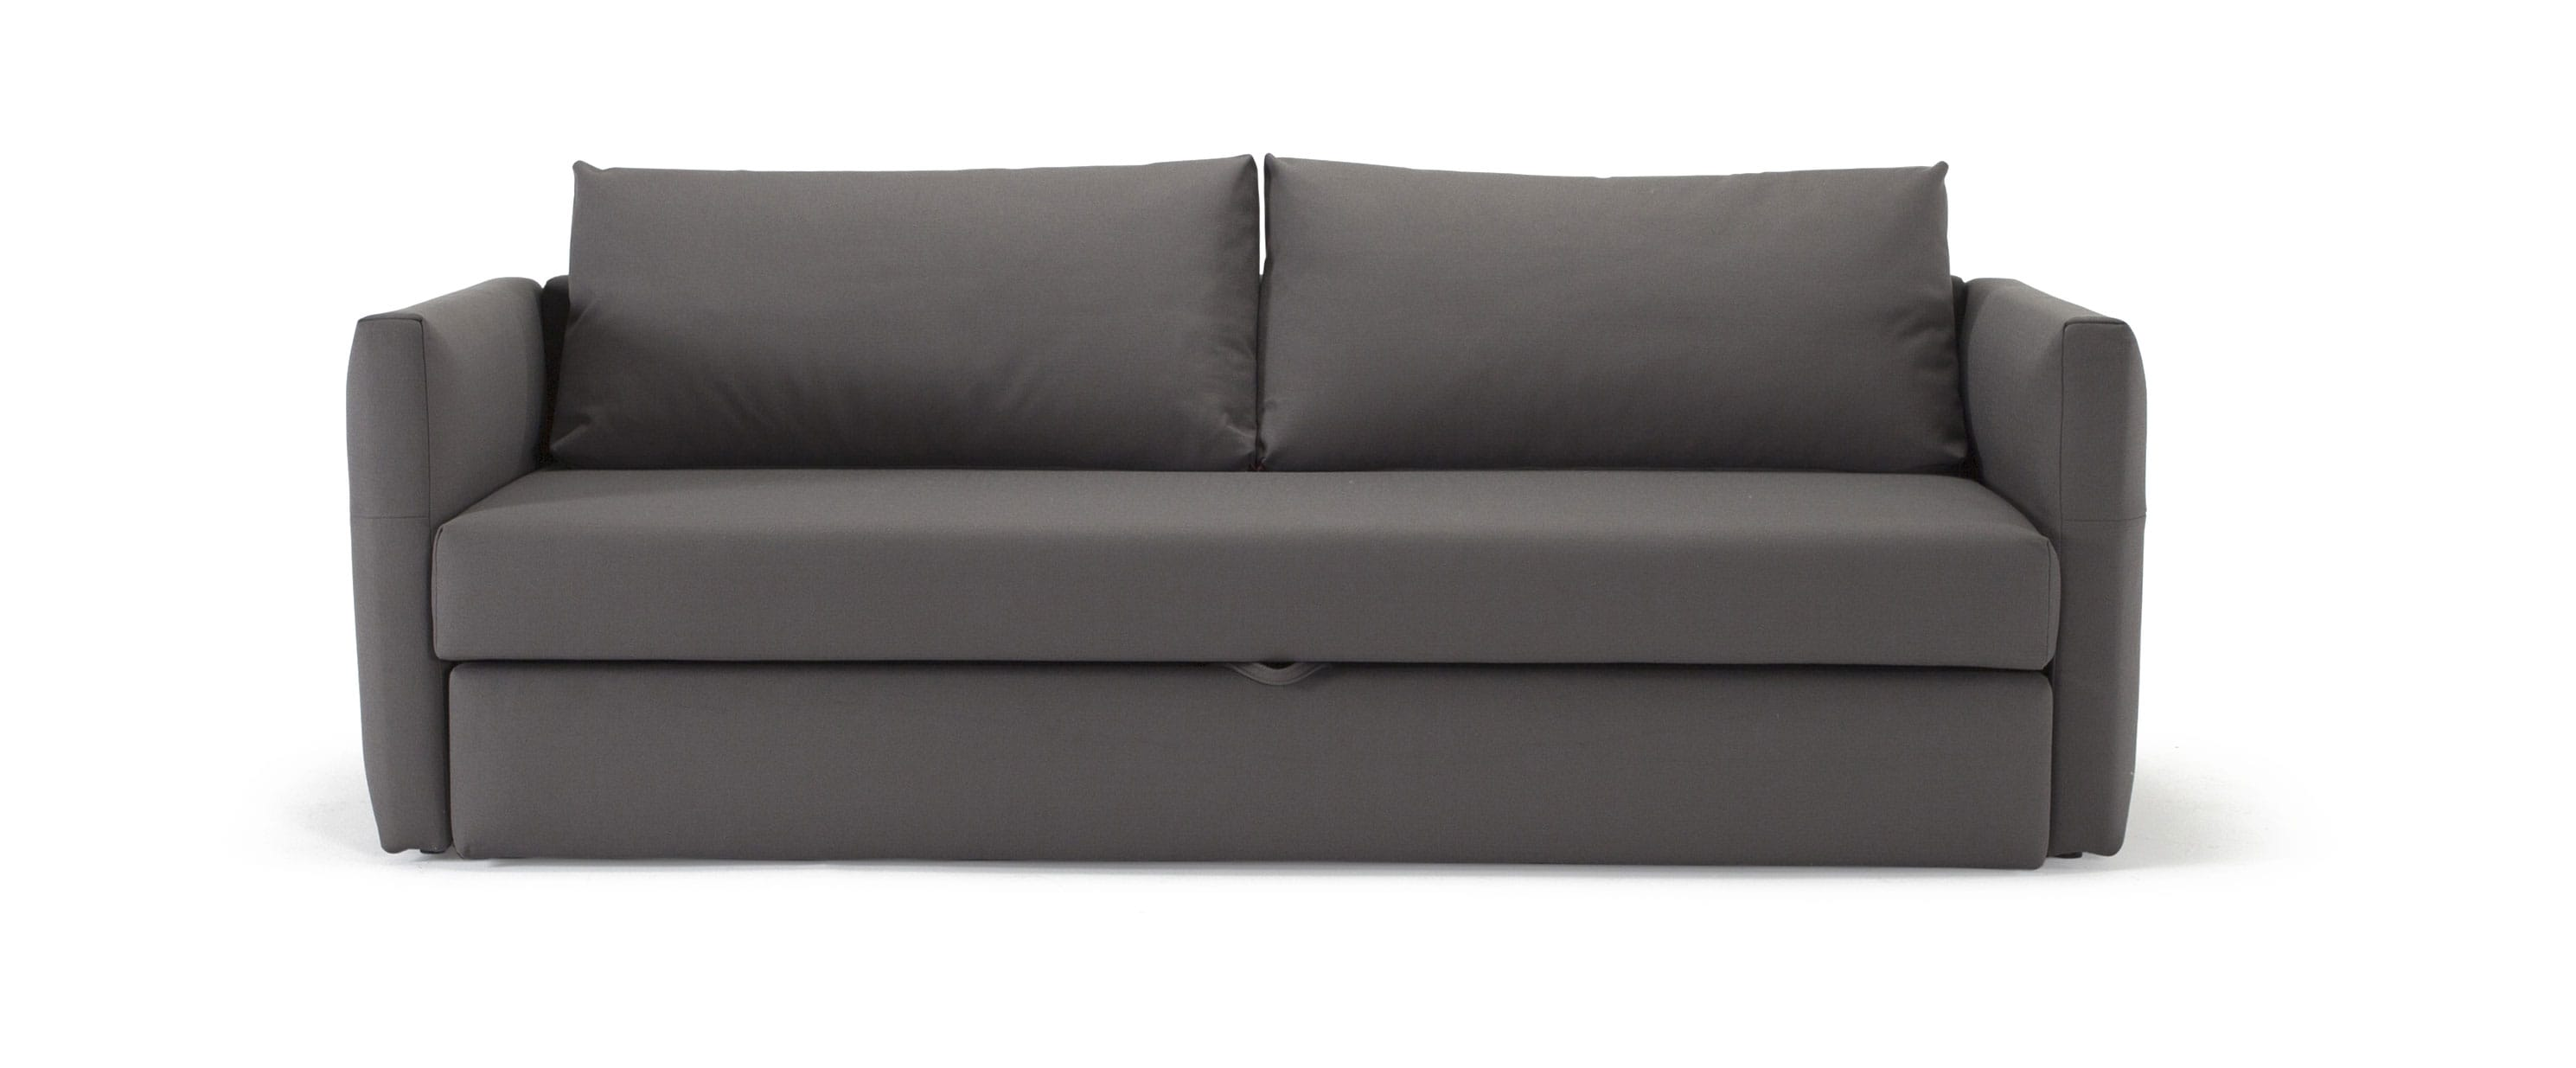 Toke Sofa Bed (Full Size) Coastal Seal Gray By Innovation